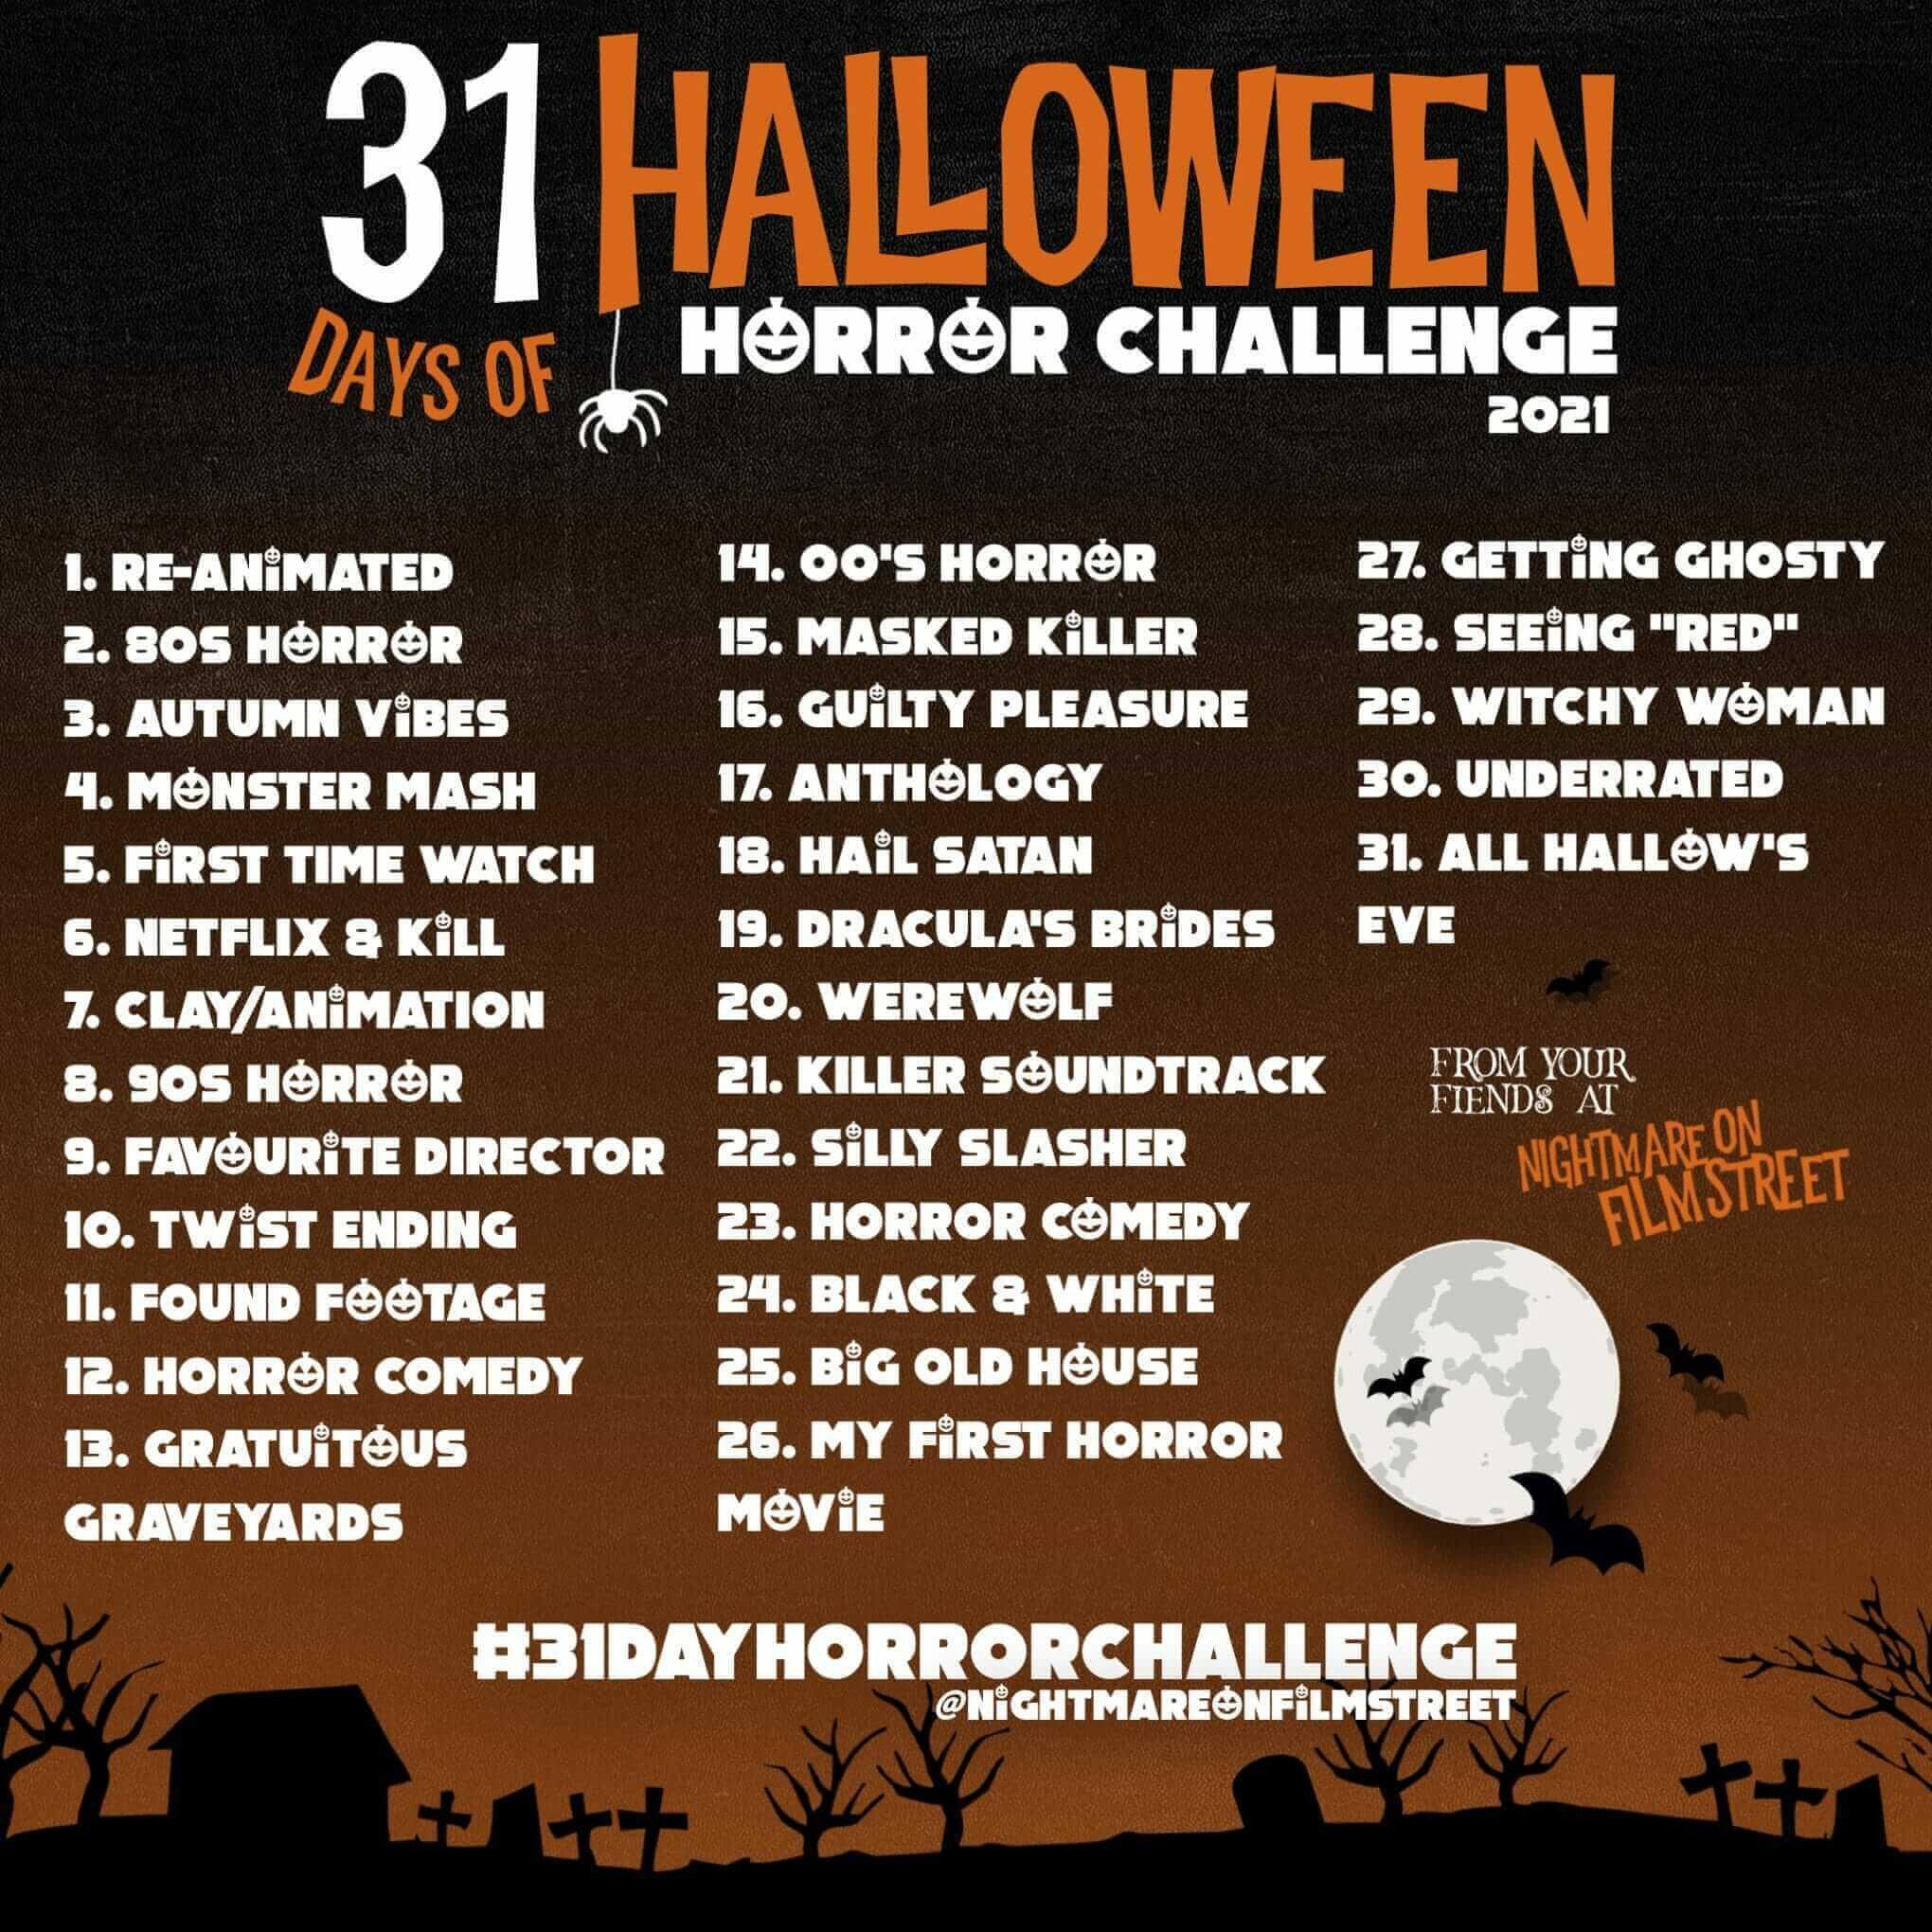 31-day-horror-movie-challenge-halloween-nightmare-on-film-street-2021.jpeg